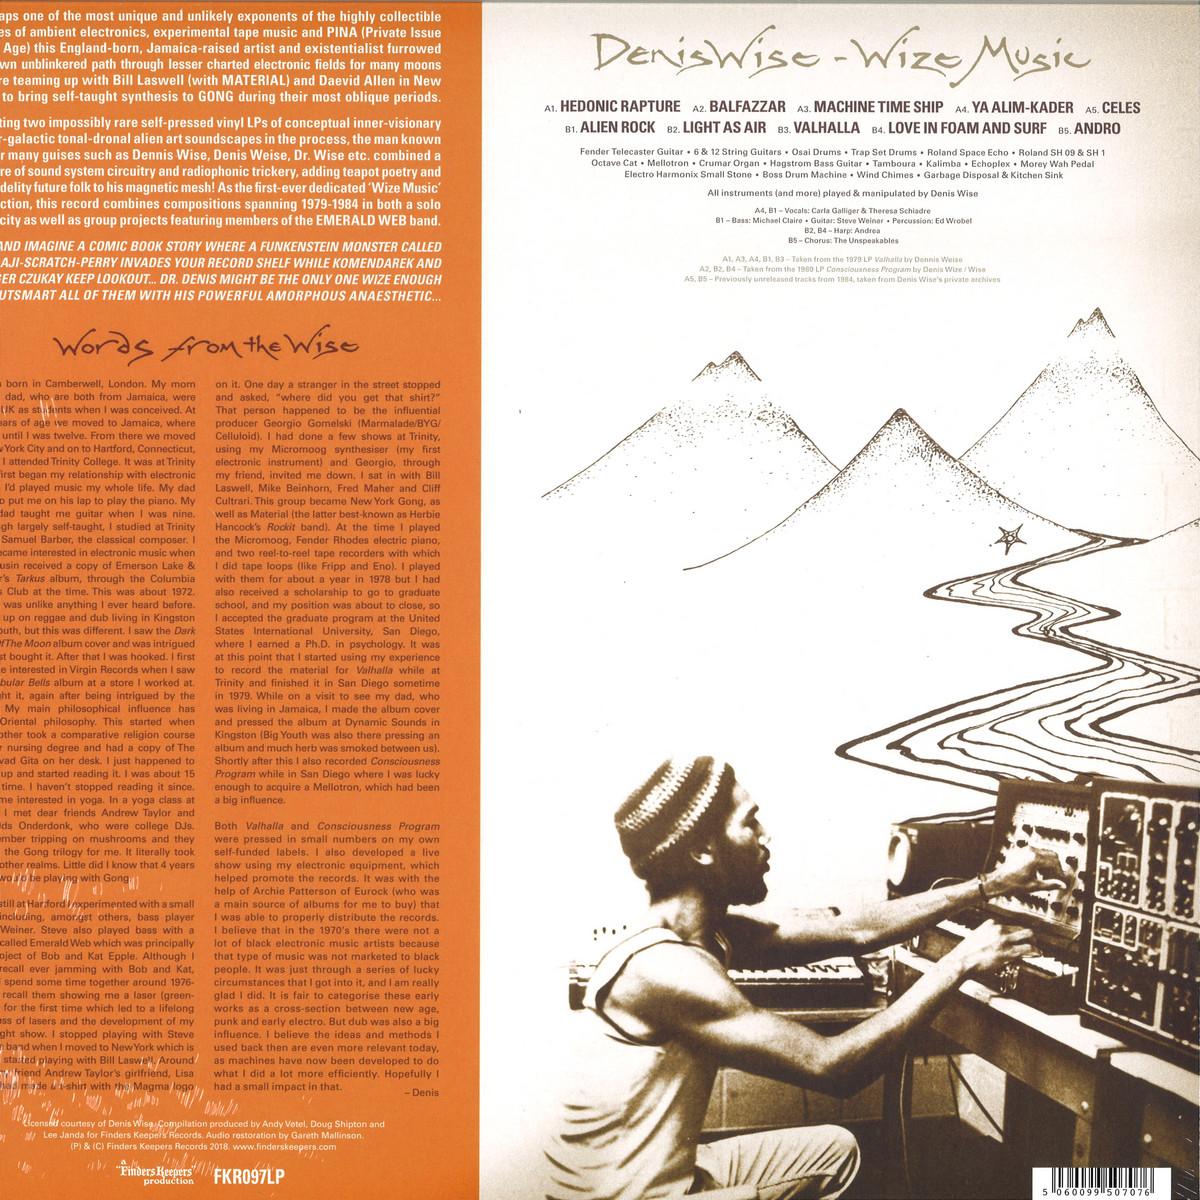 deejay de - Finders Keepers Records